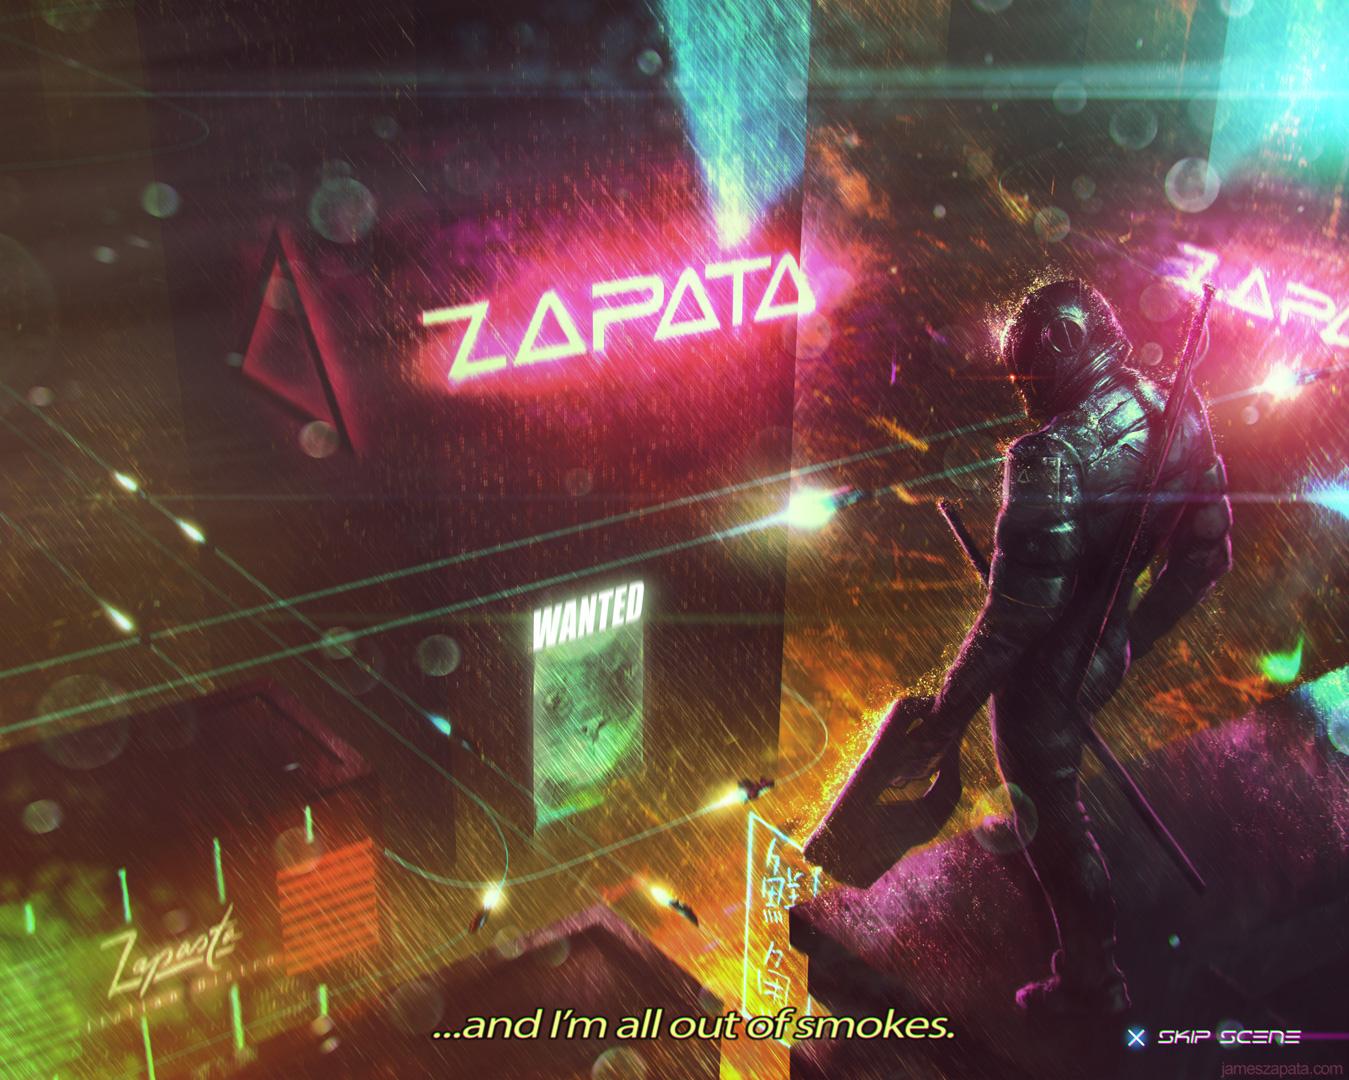 James Zapata